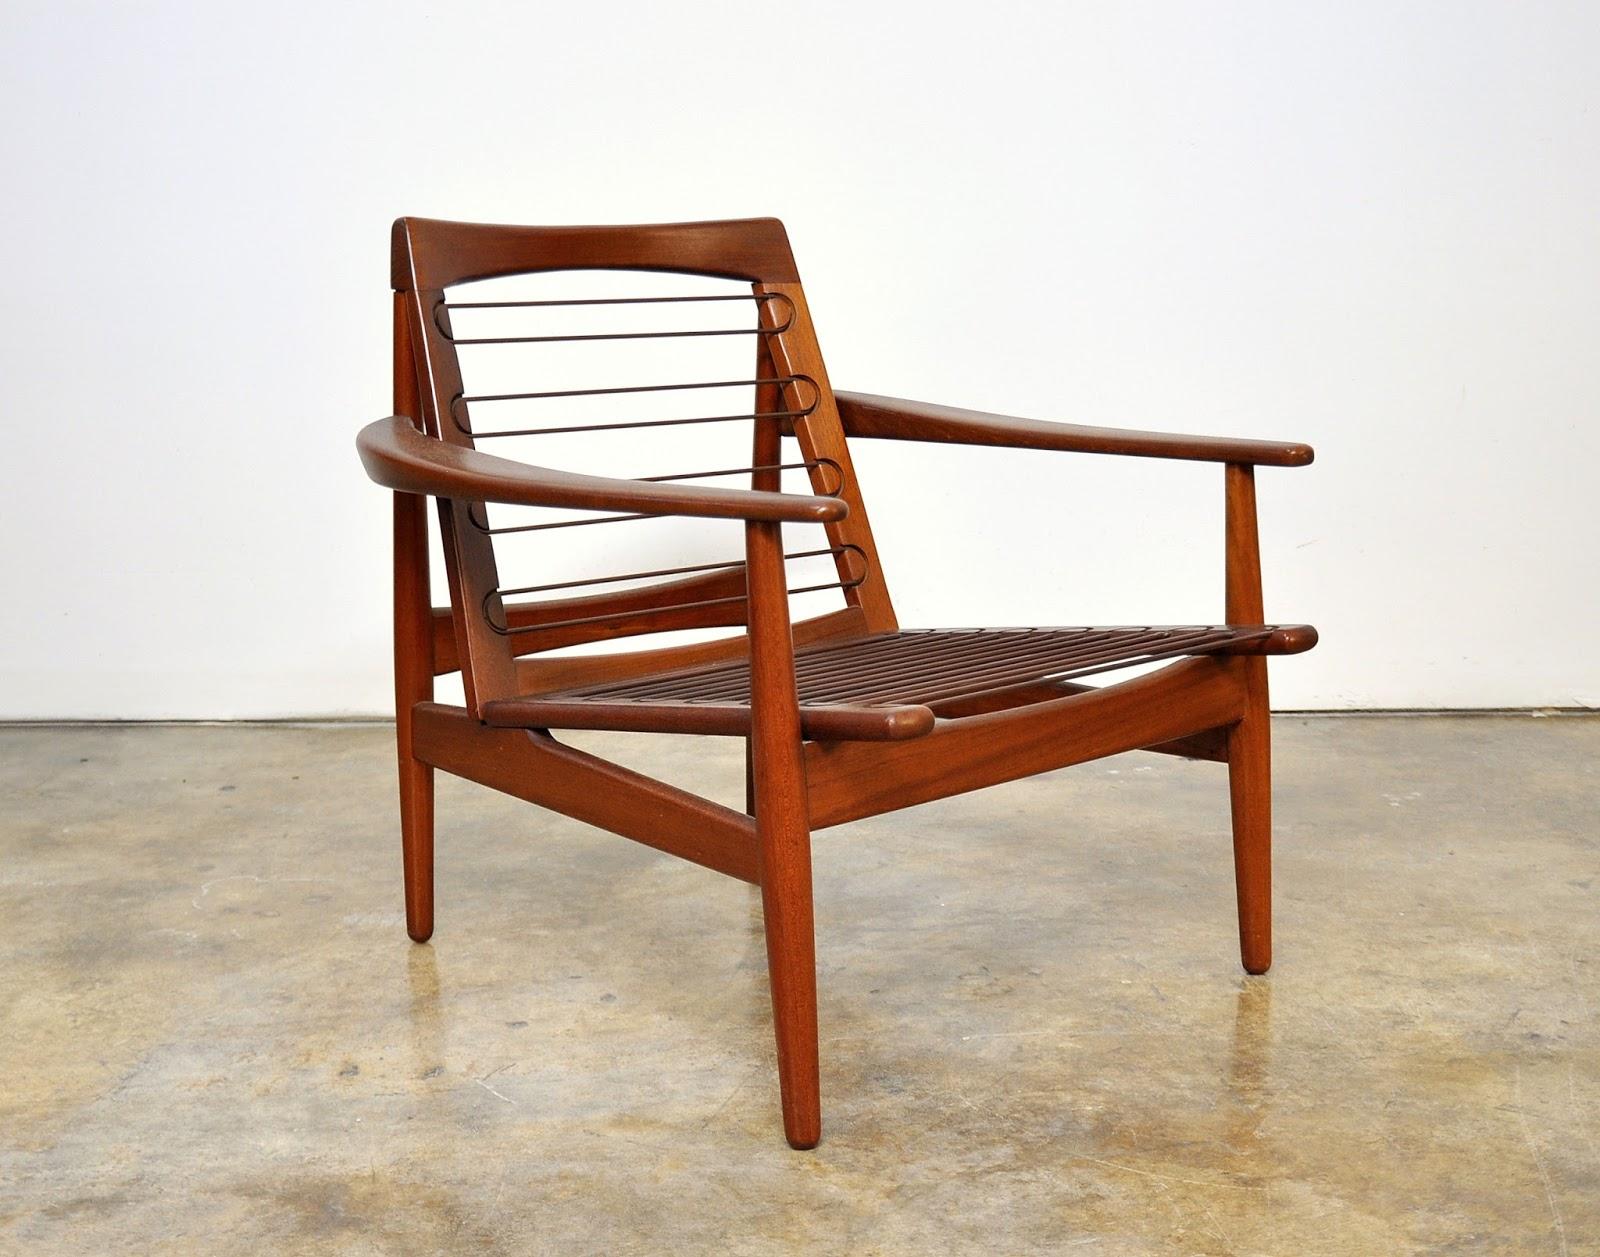 Select Modern Grete Jalk For Glostrup Mobelfabrik Teak Lounge Chair